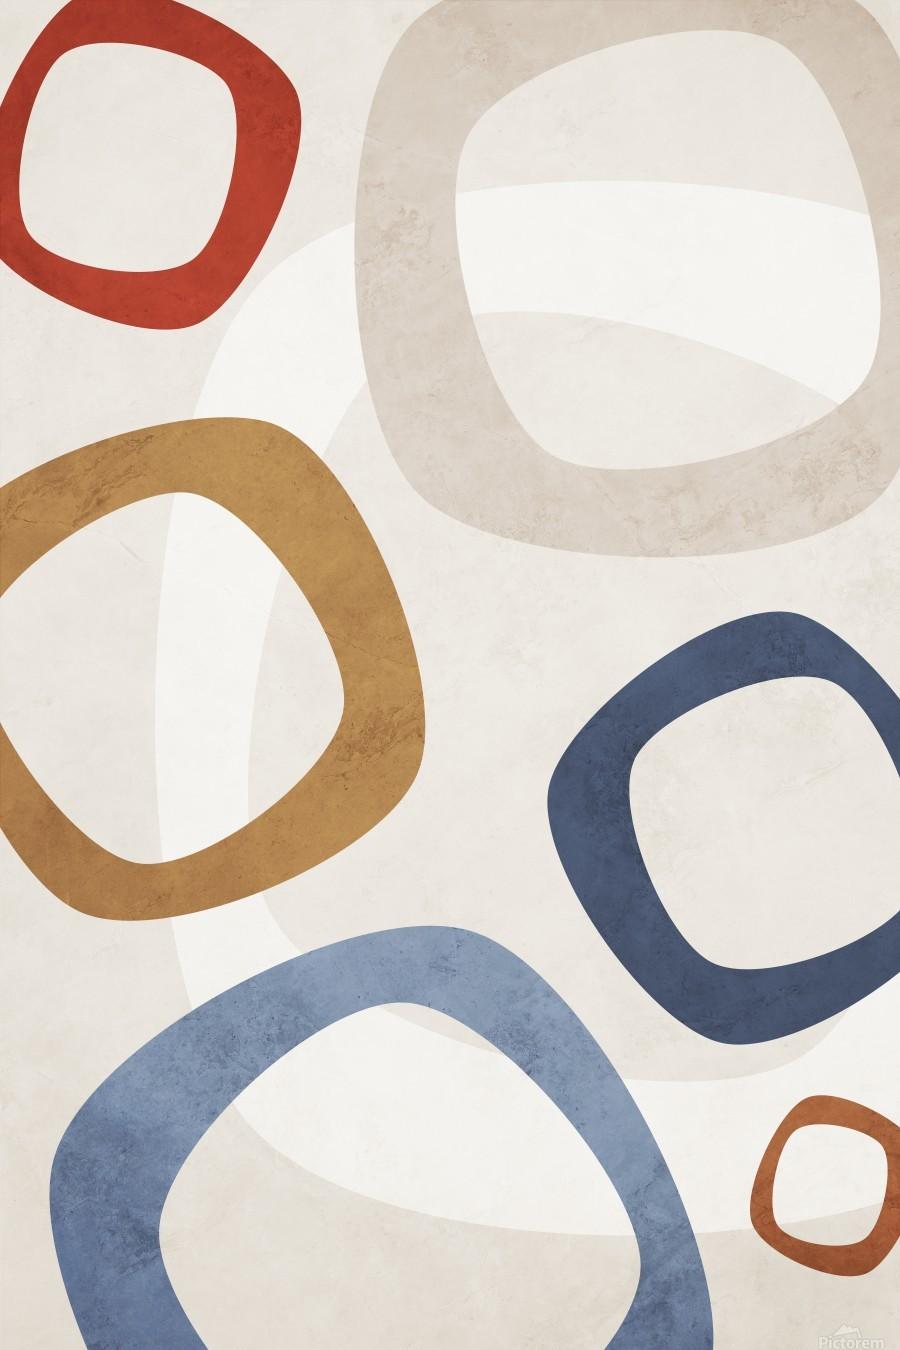 Shapes 08 - Abstract Geometric Art Print  Print